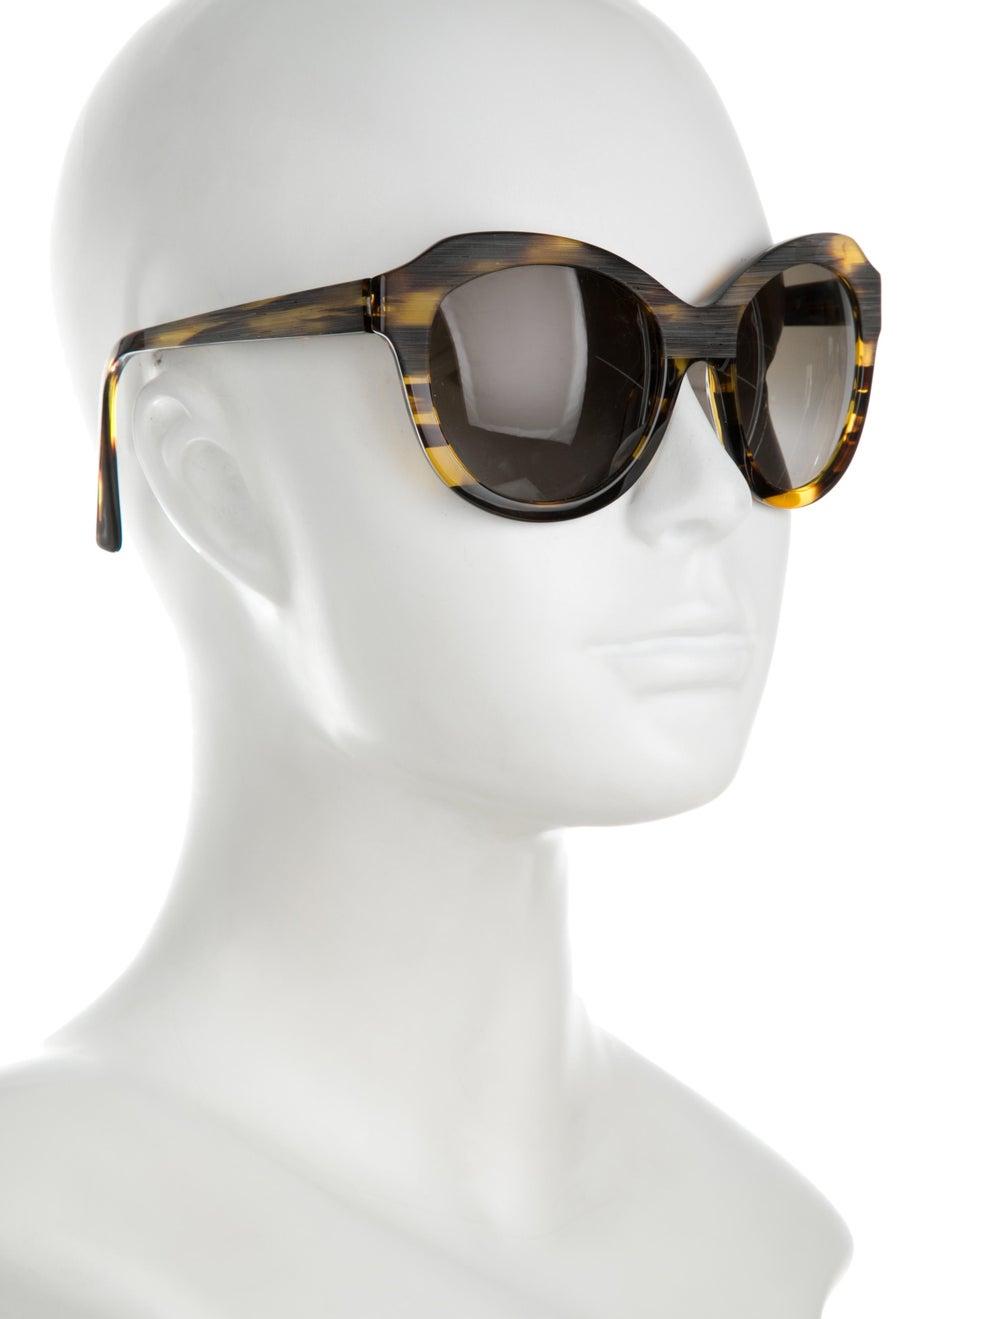 Alain Mikli Tortoiseshell Oversize Sunglasses - image 4